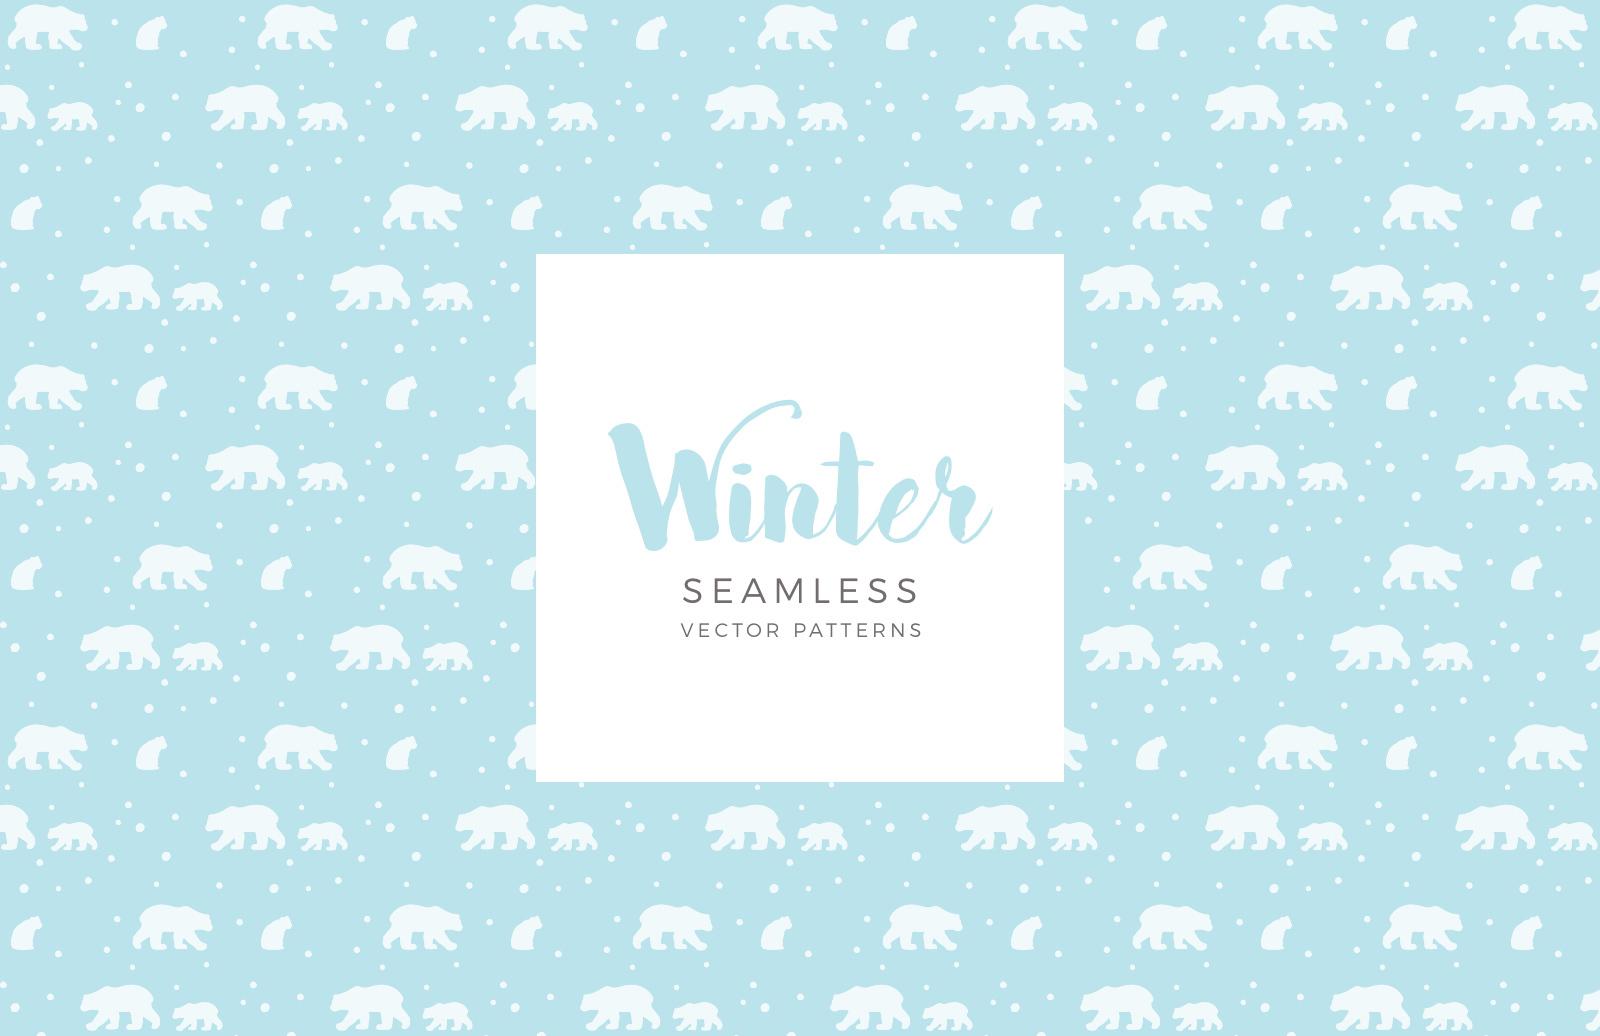 Seamless Vector Winter Patterns